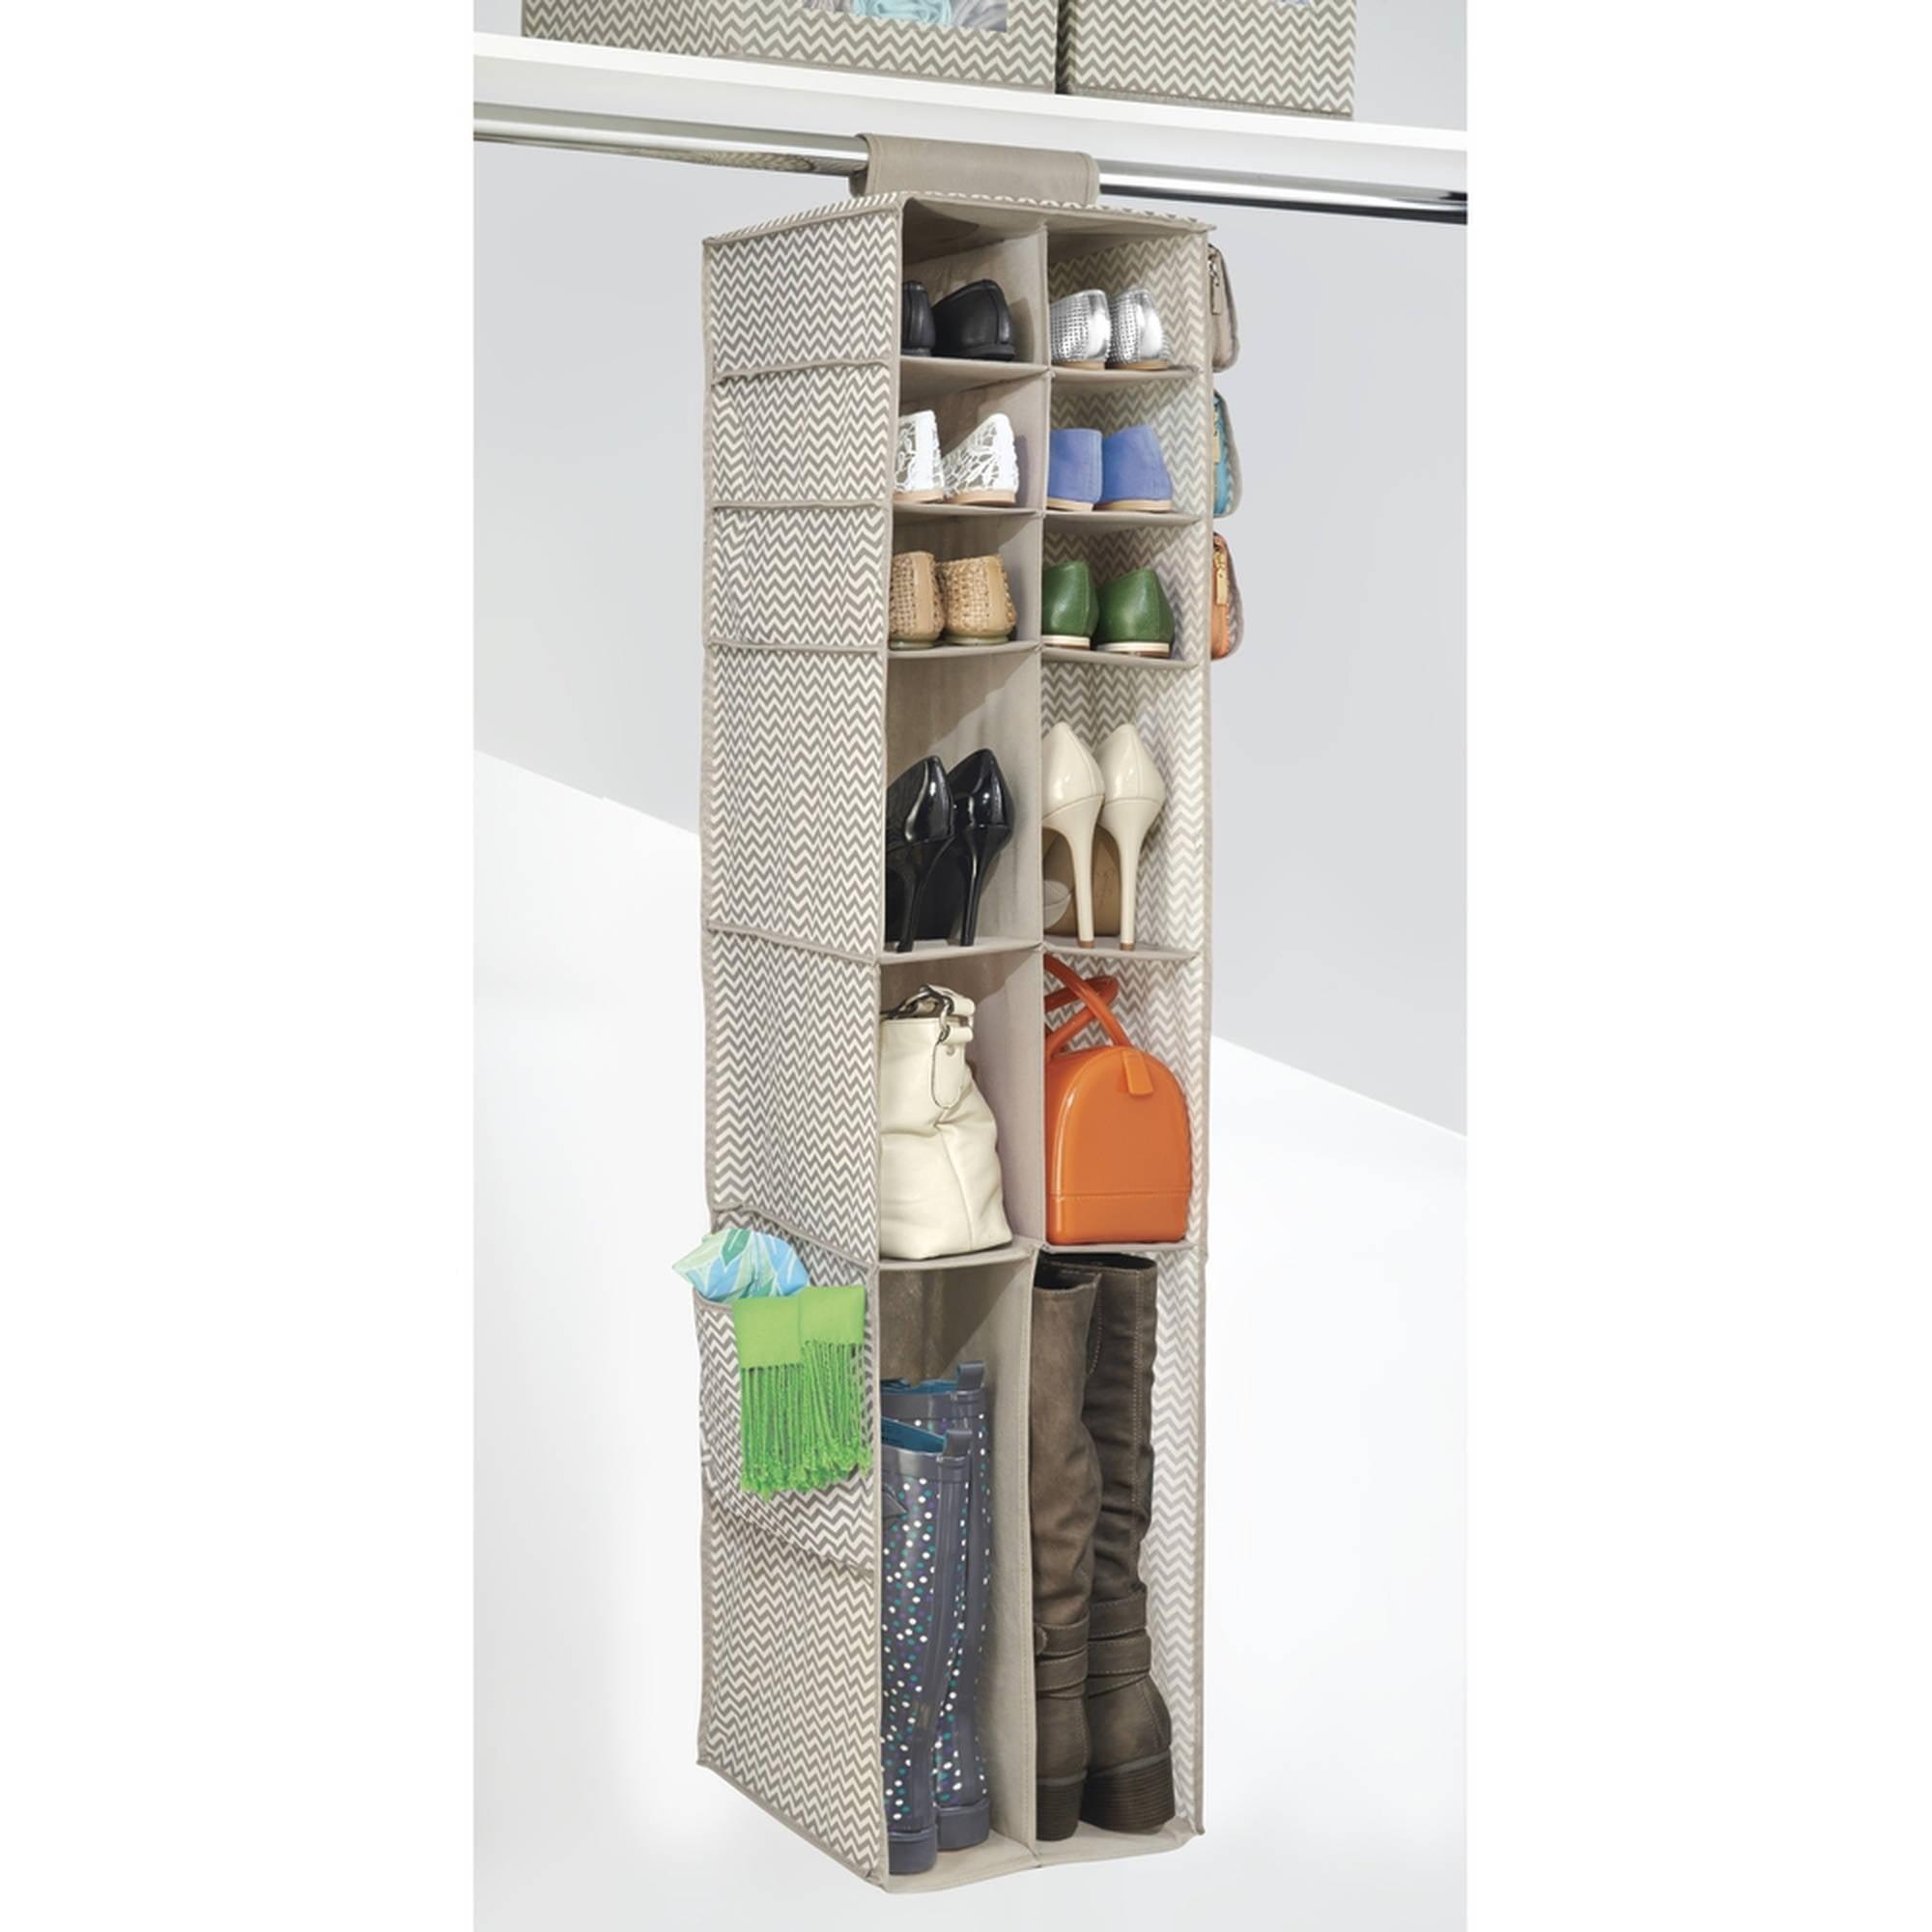 InterDesign Chevron Fabric Hanging Closet Storage Organizer, 16 Compartments, Taupe/Natural